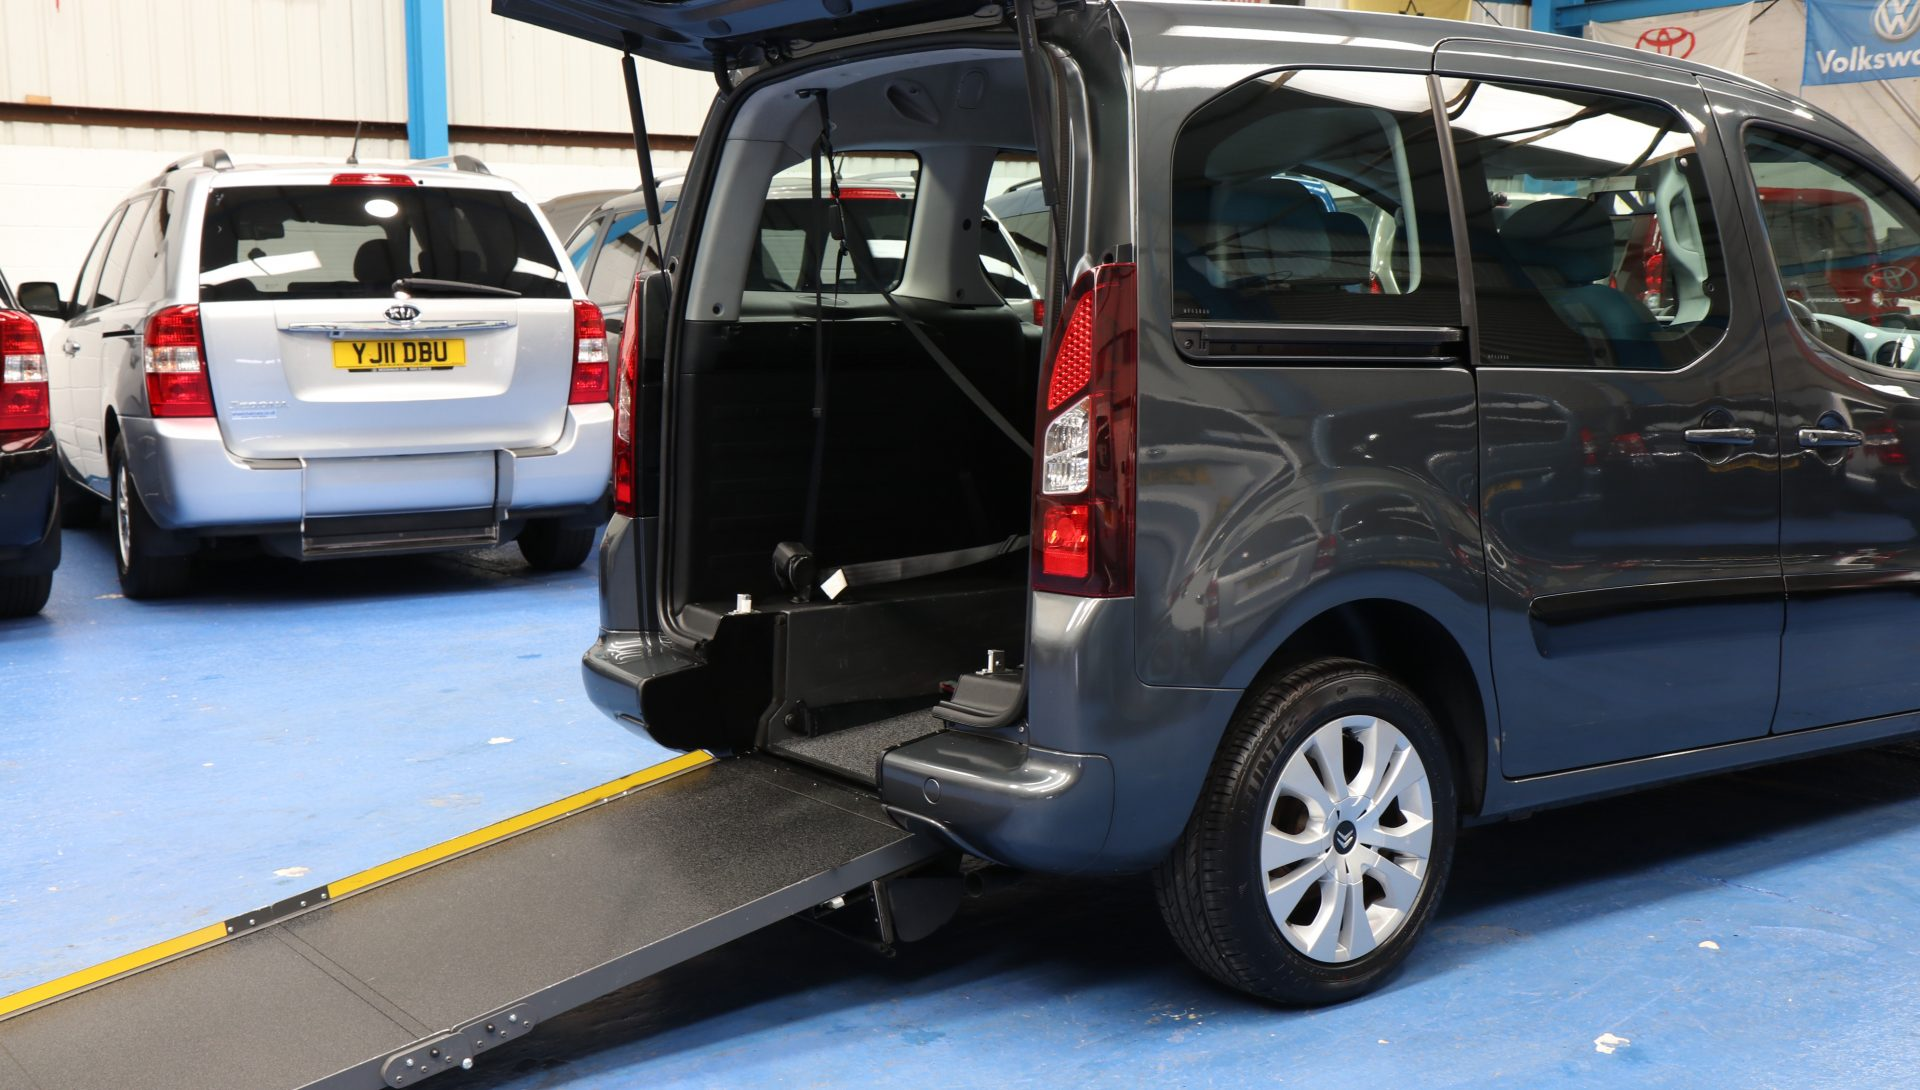 Berlingo Wheelchair access vehicle wf63